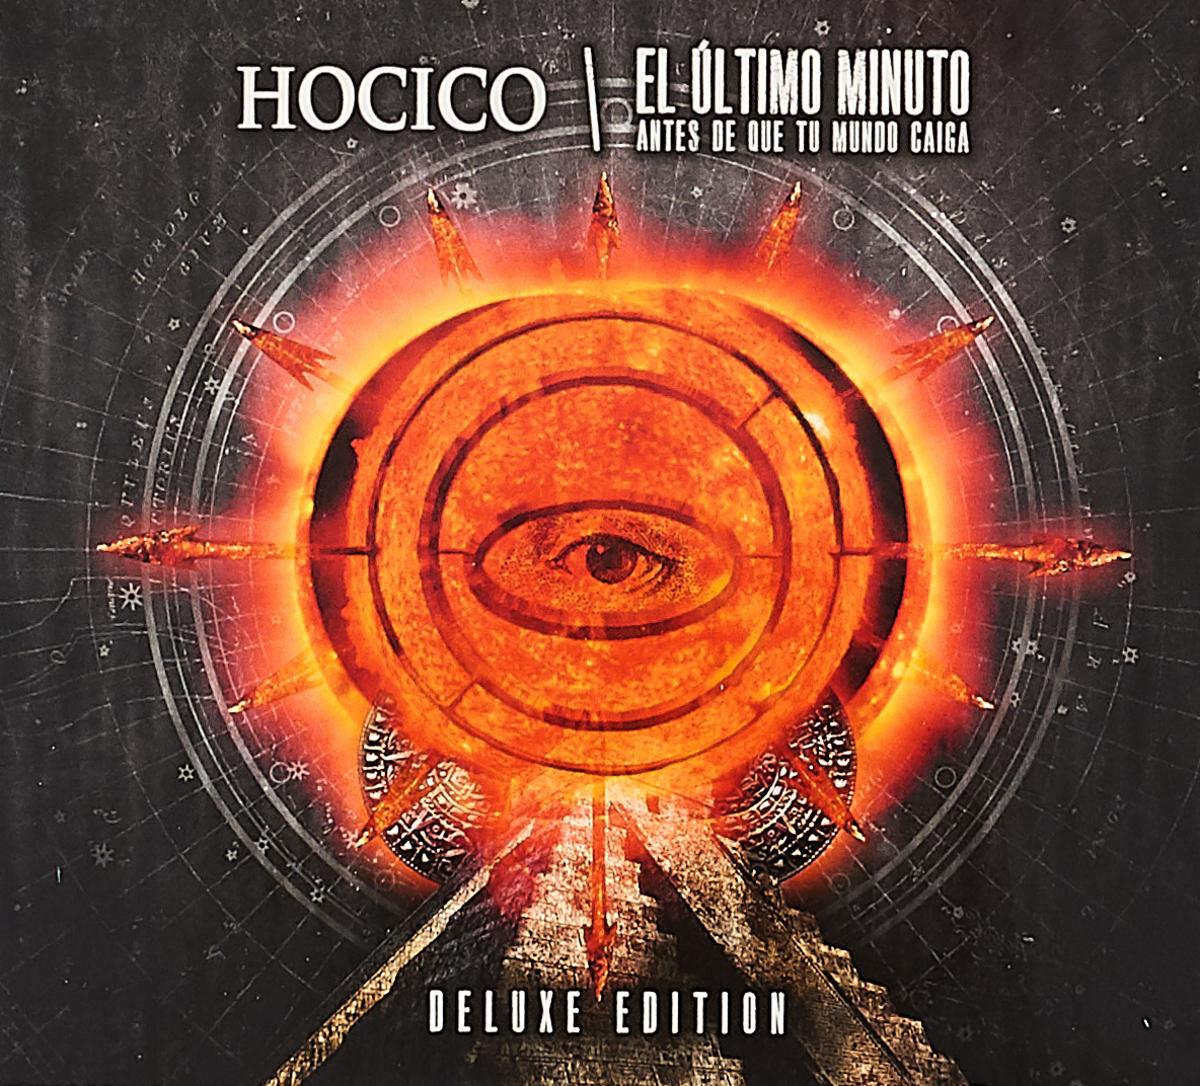 Фото - Hocico Hocico. El Ultimo Minuto (Limited Edition) (2 CD) cd led zeppelin ii deluxe edition